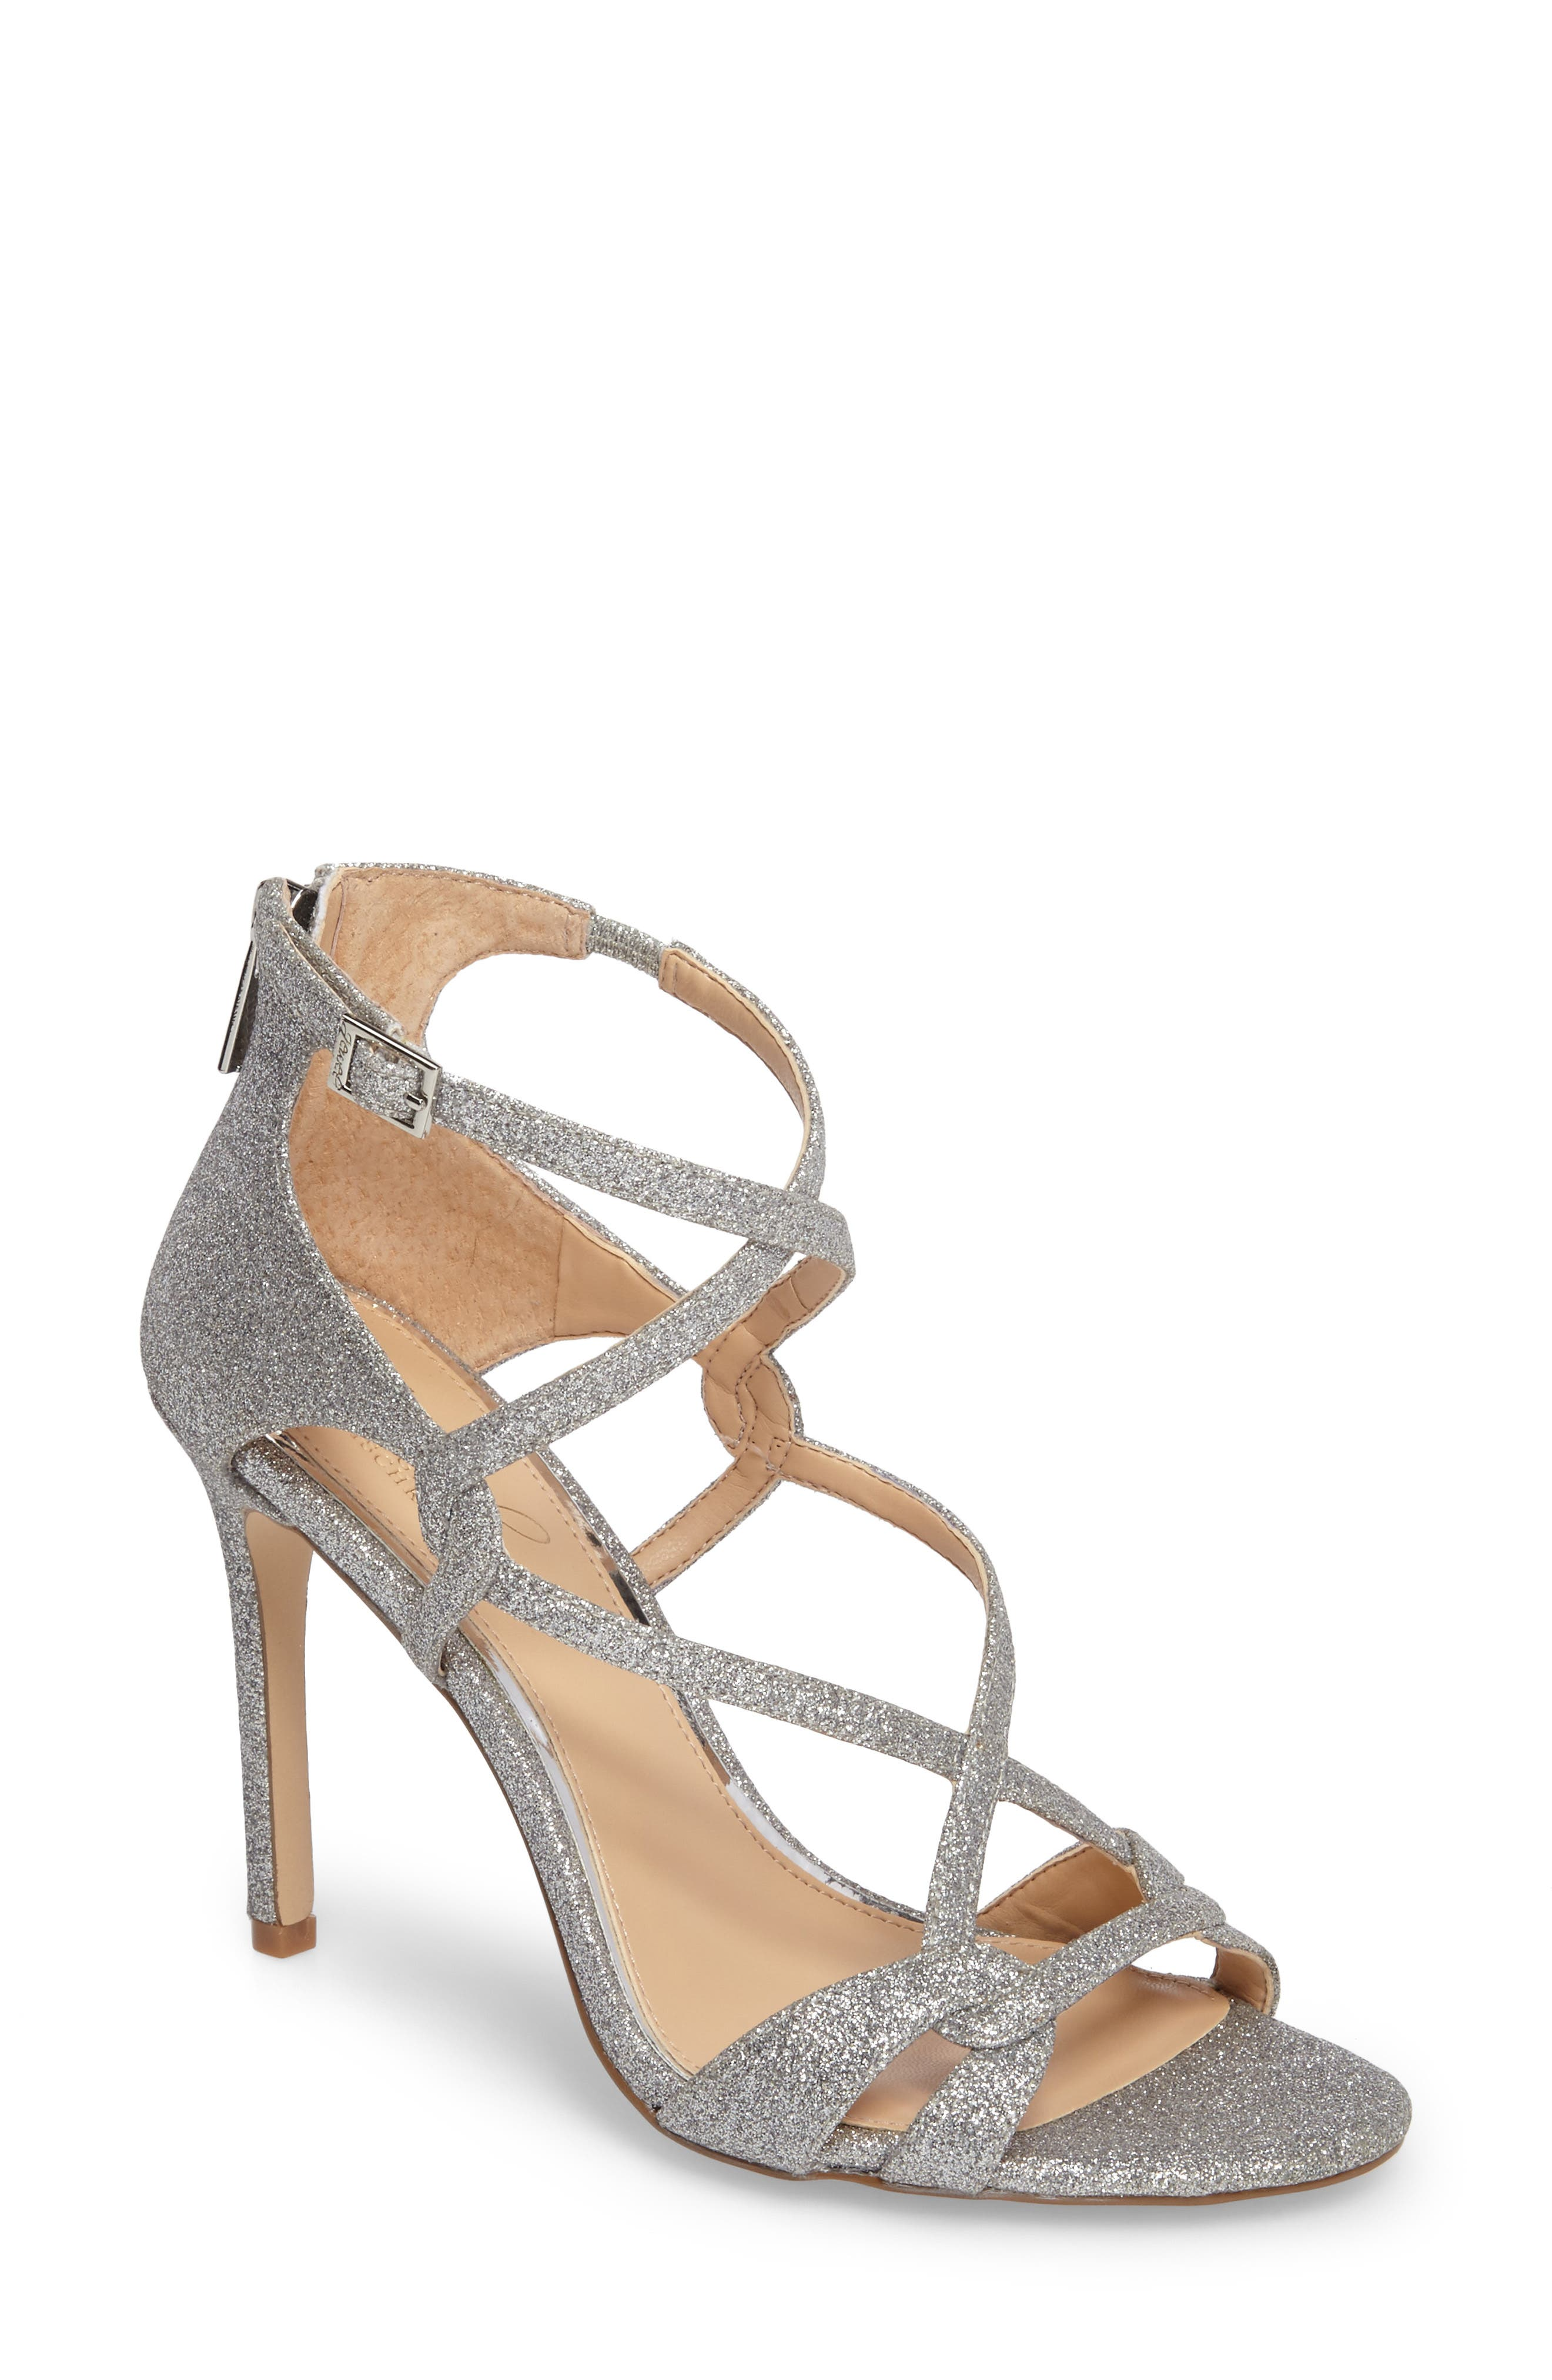 Main Image - Jewel Badgley Mischka Aliza Strappy Glitter Sandal (Women)